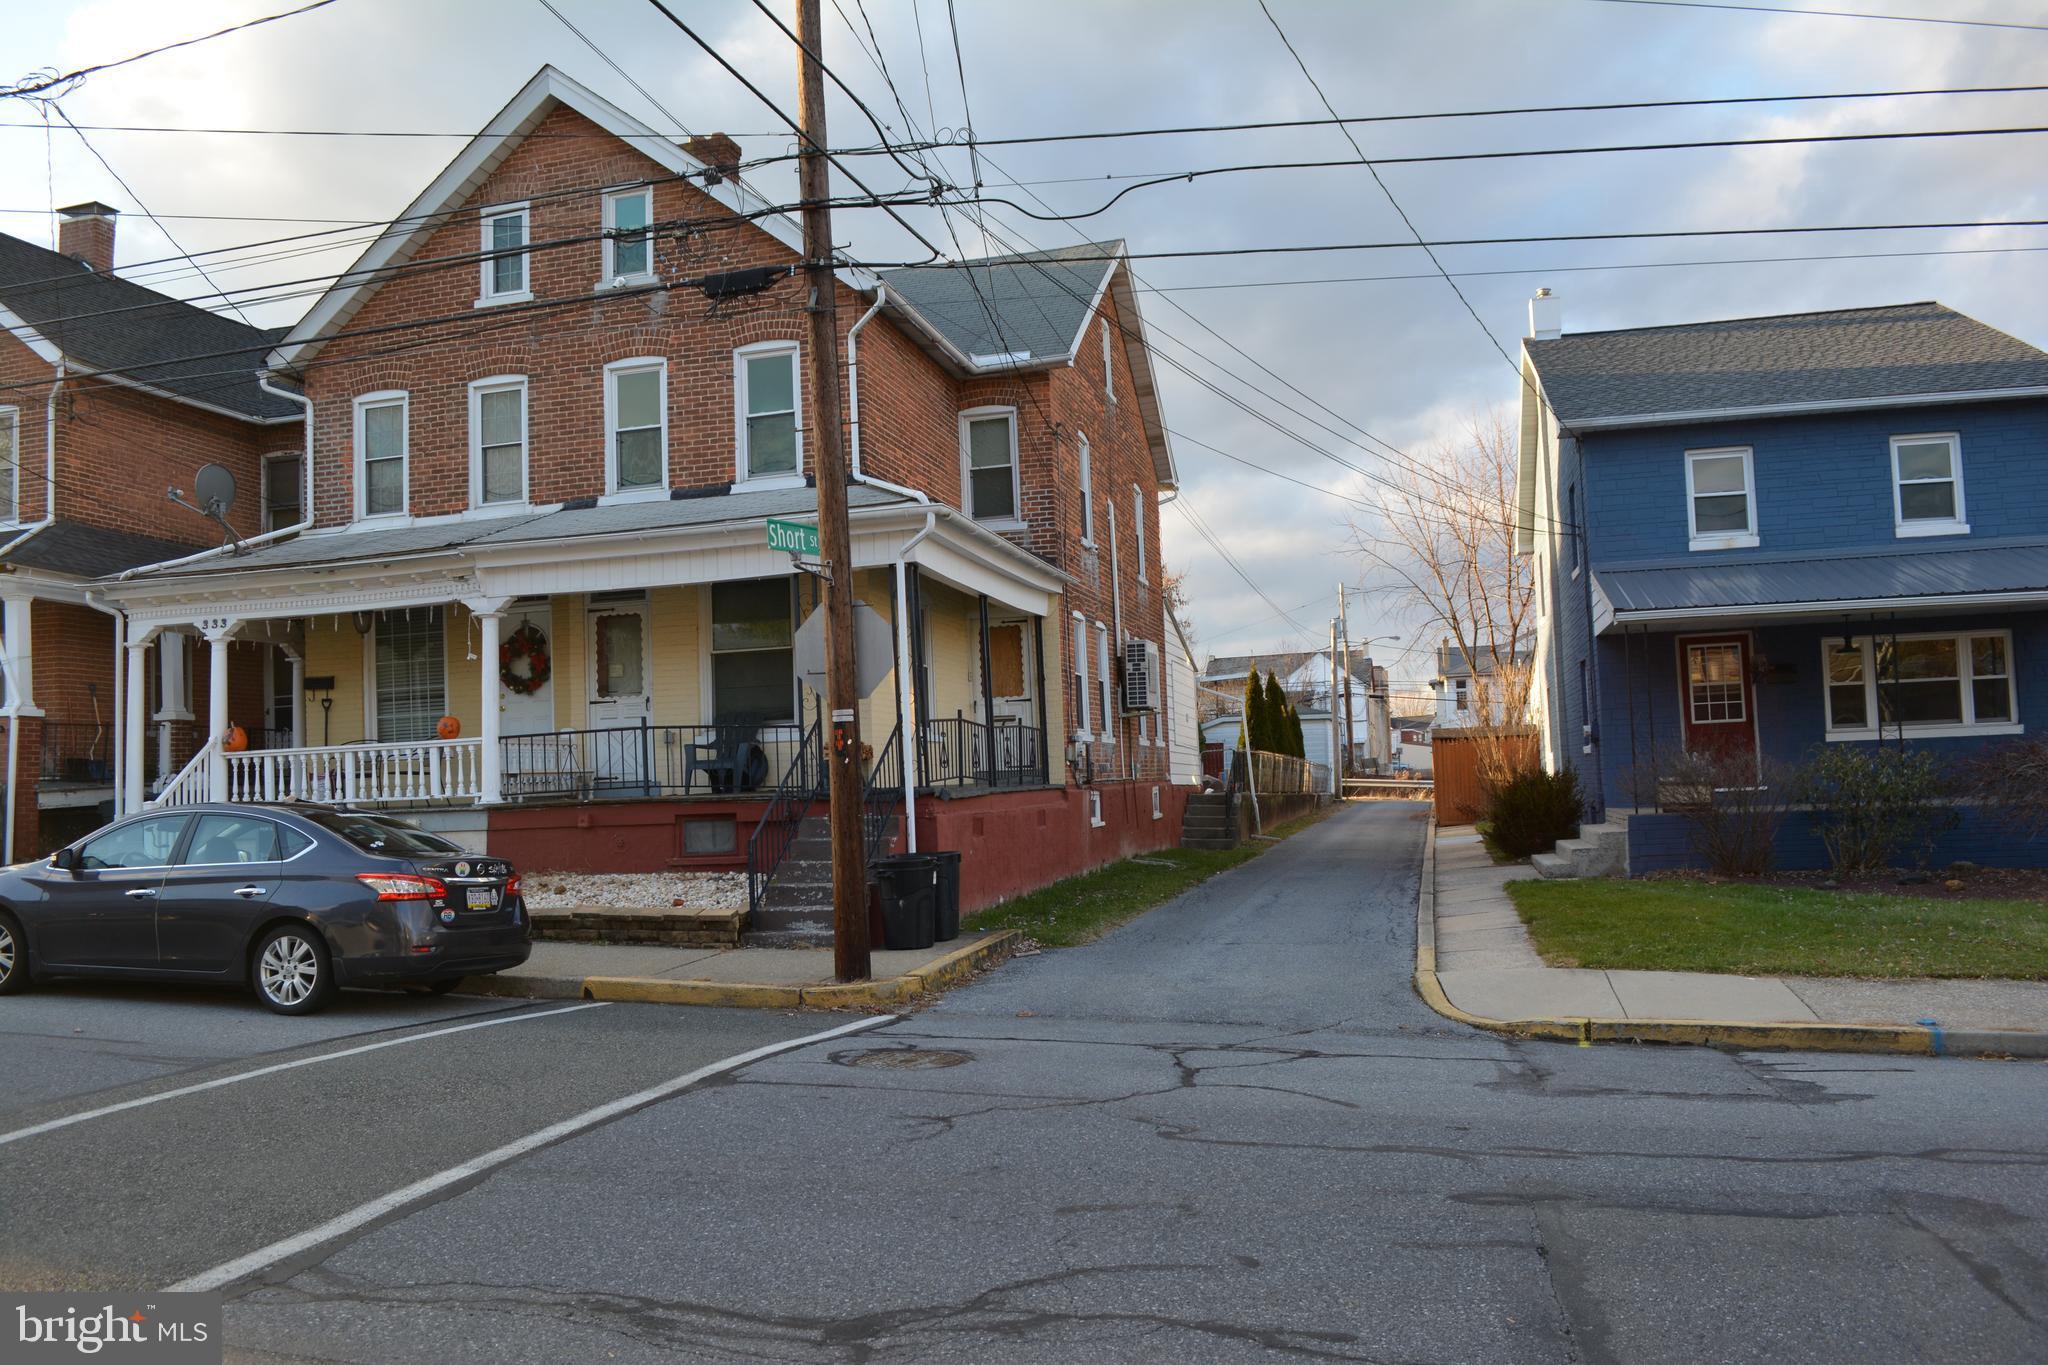 331 BROAD STREET, EMMAUS, PA 18049